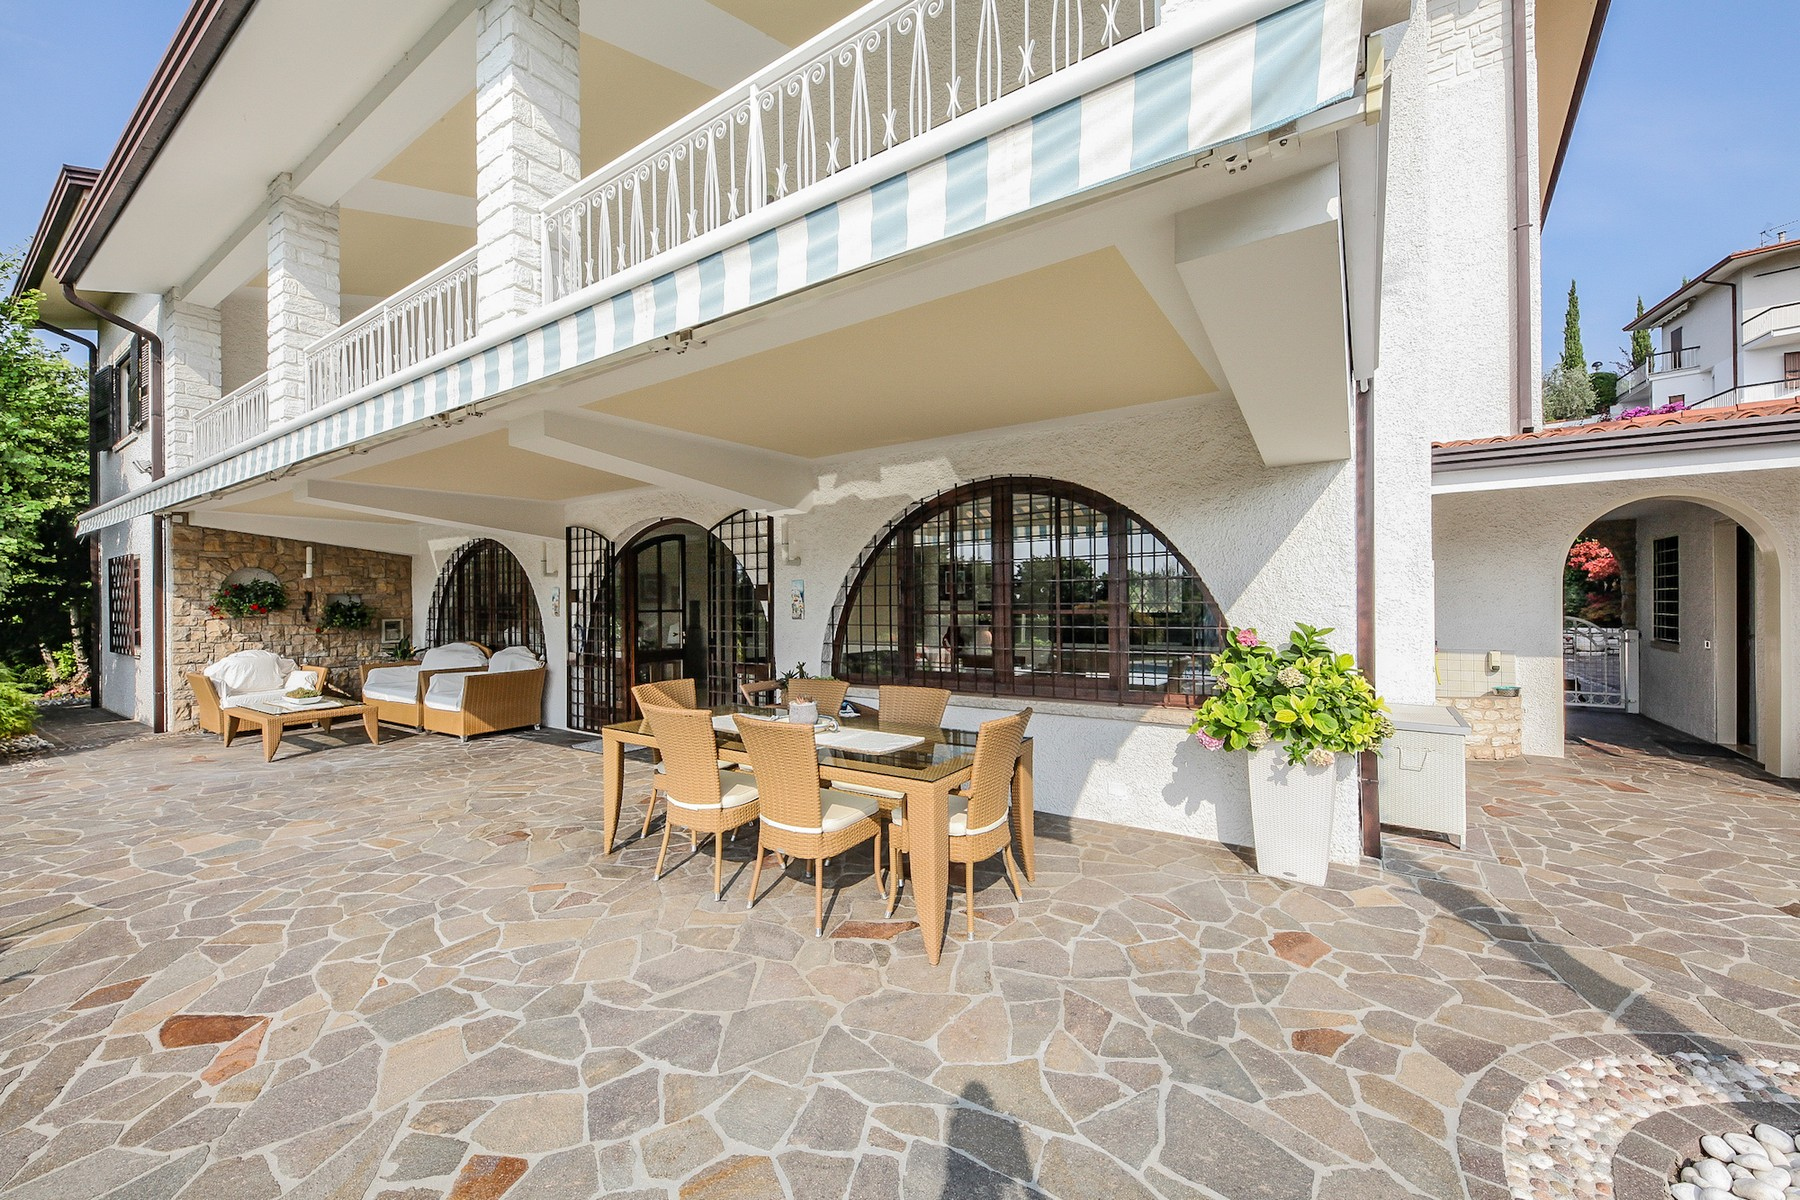 Villa in Vendita a Padenghe Sul Garda: 5 locali, 330 mq - Foto 18